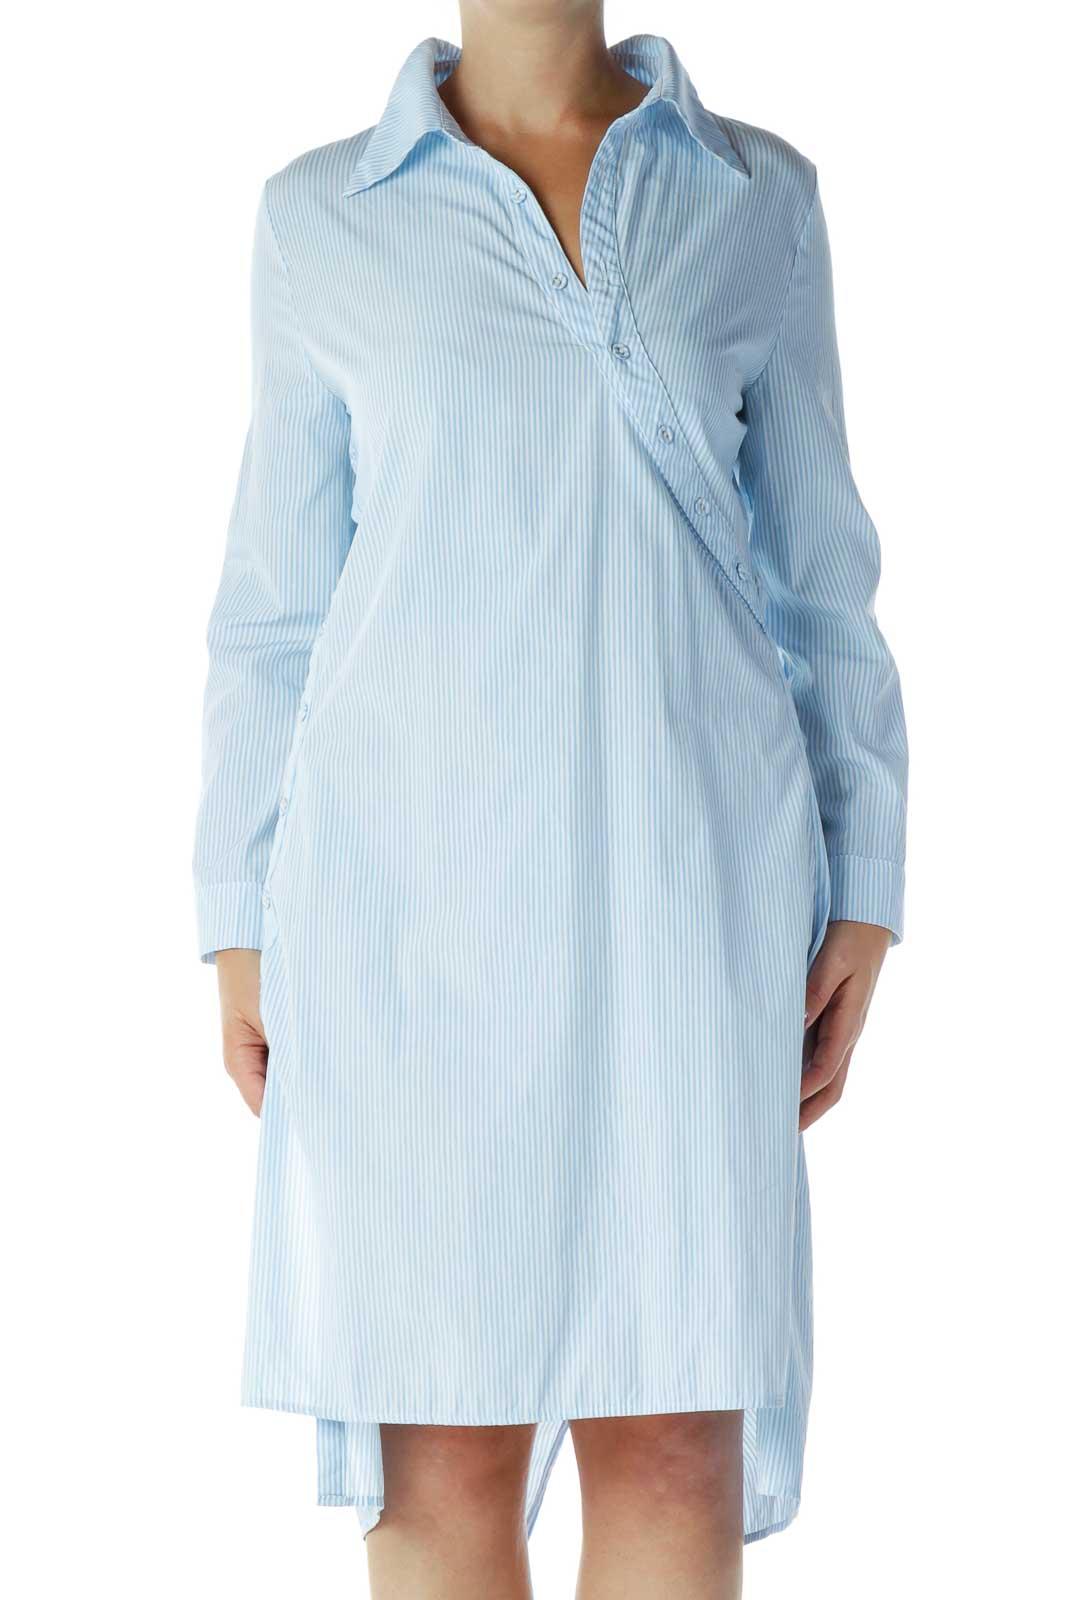 Blue & White Pinstripe Shirt Dress